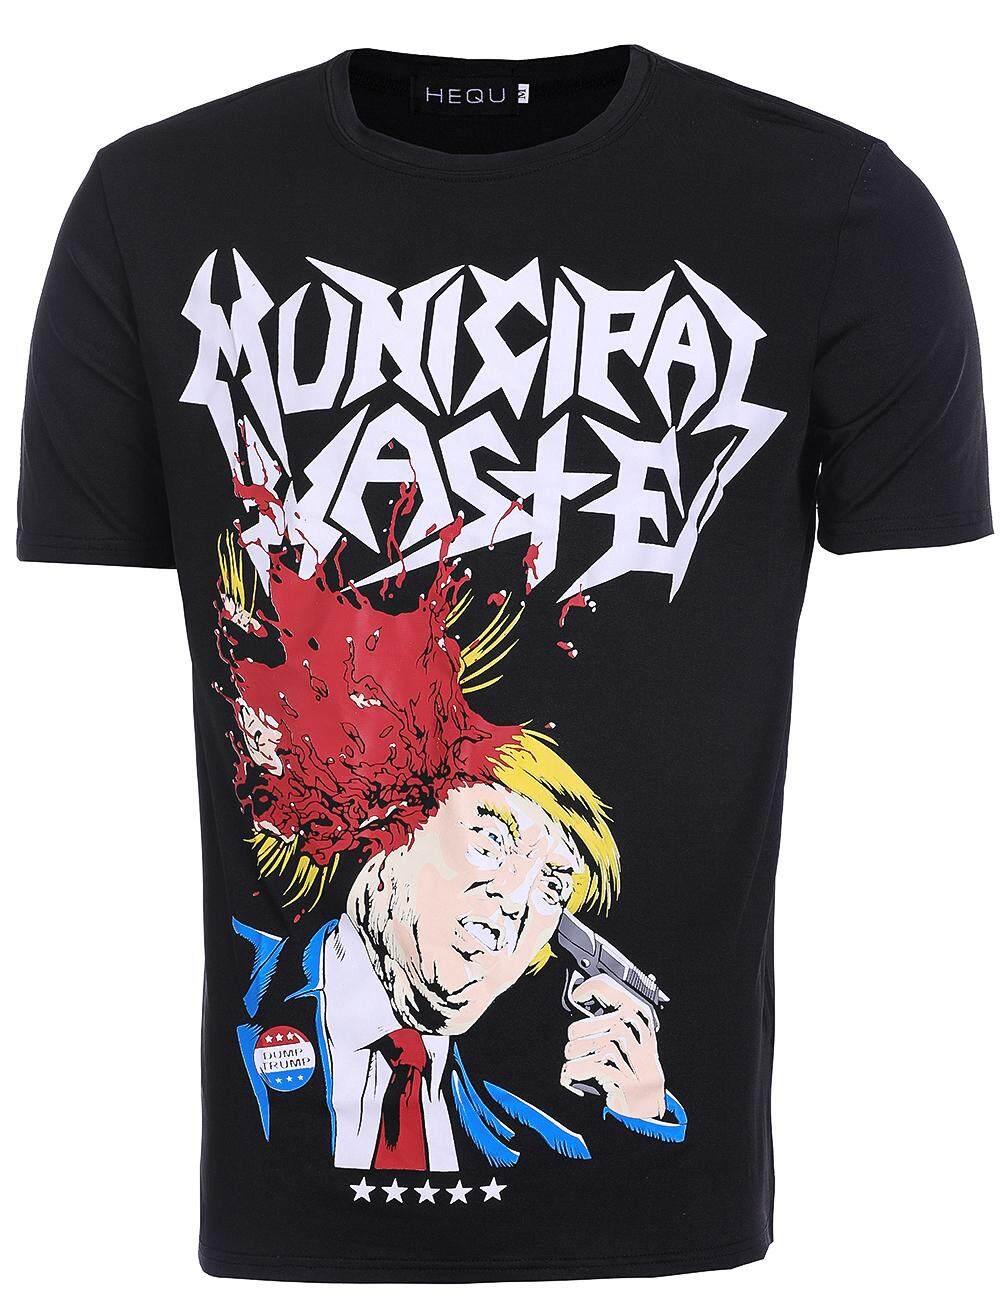 Blacklabel Kaos Hitam BL KURT COBAIN 05 T-Shirt Rock Star Metal Band Gothic -